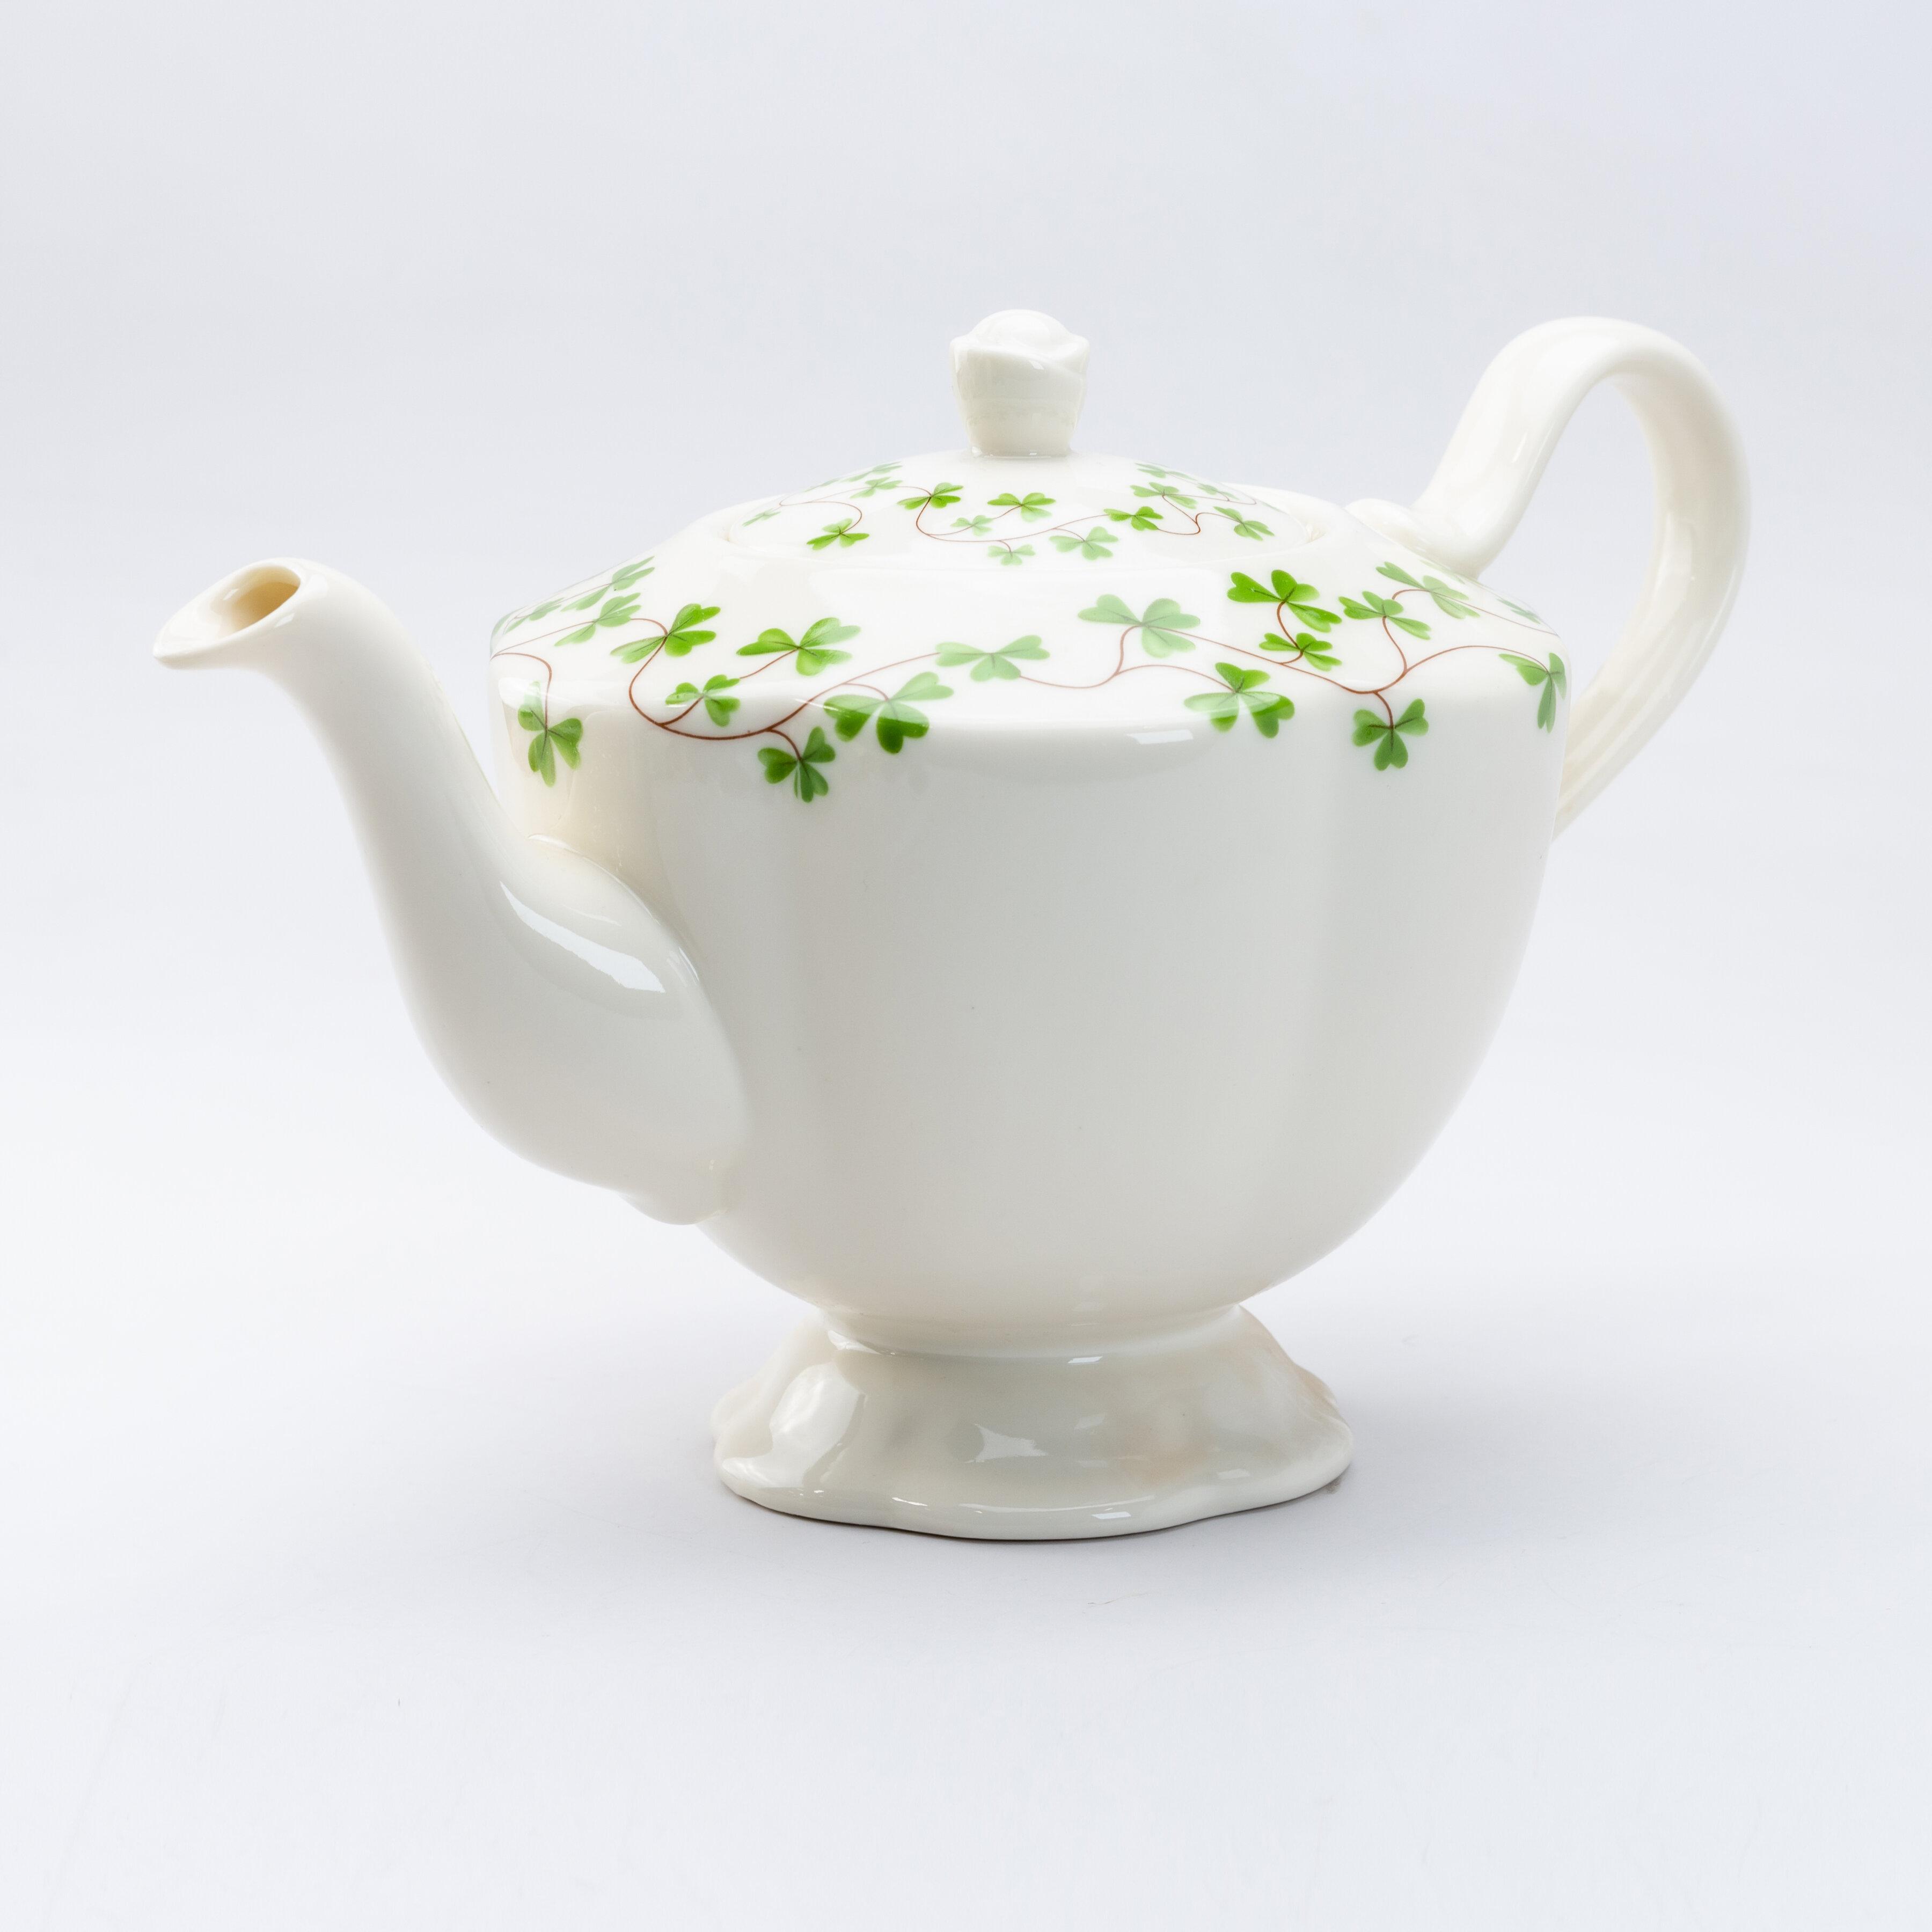 Vintage Kettle Teapot,Gold Teapot,Beige Teapot,Ceramic Teapot Drinkware Teapot,kitchenware,Rare Teapot,Cute Teapot,Teapot Gift,Teapot